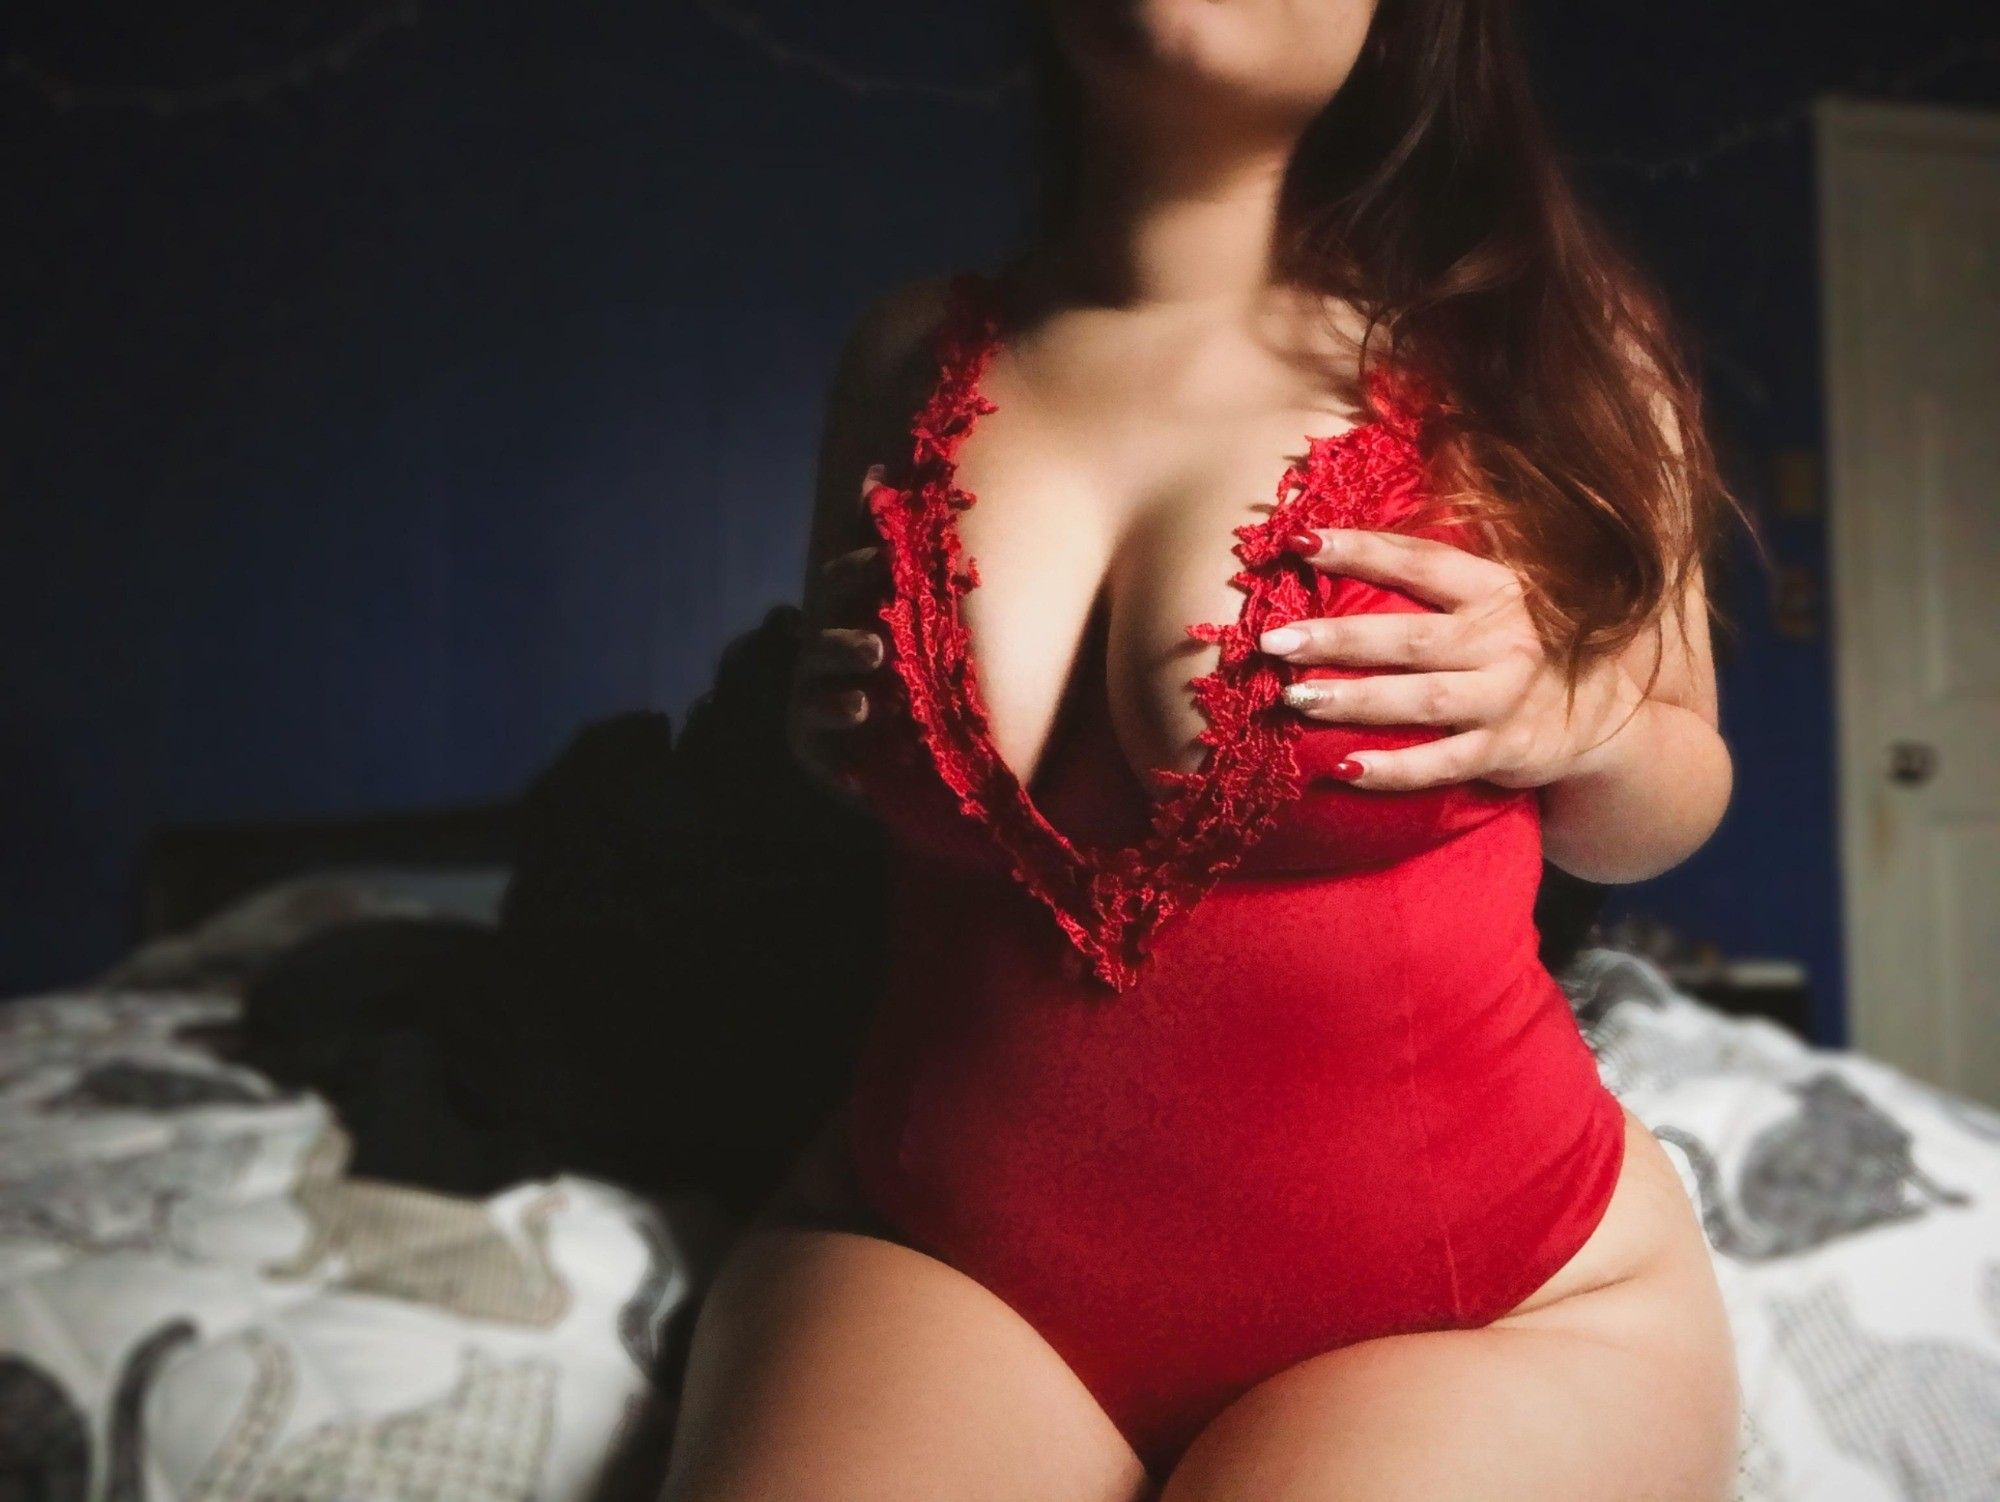 Morra julia, tetona con imperdible pack casero de nudes.!!! 1